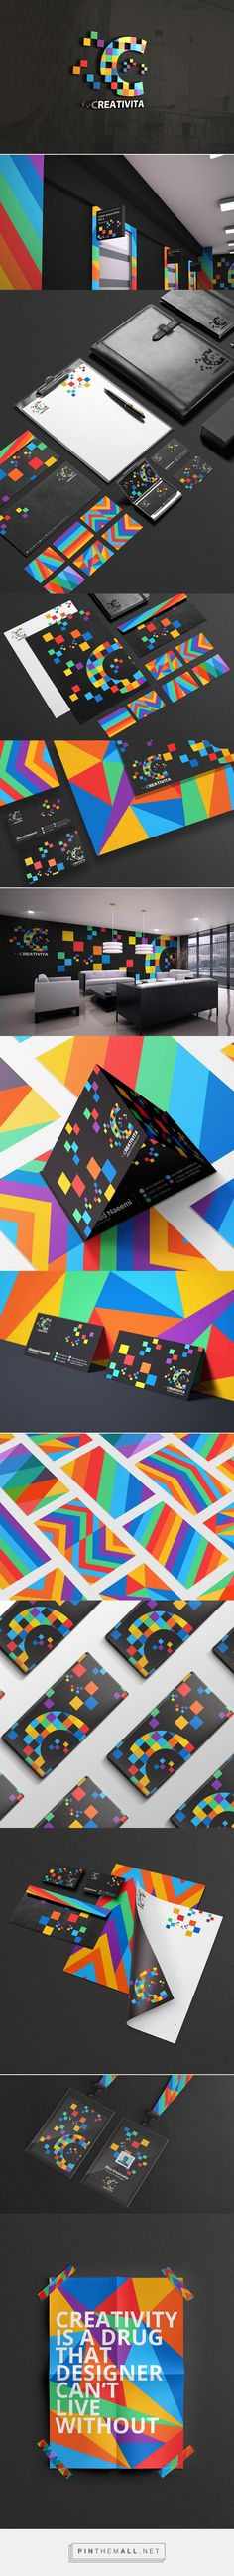 Creativita brand identity